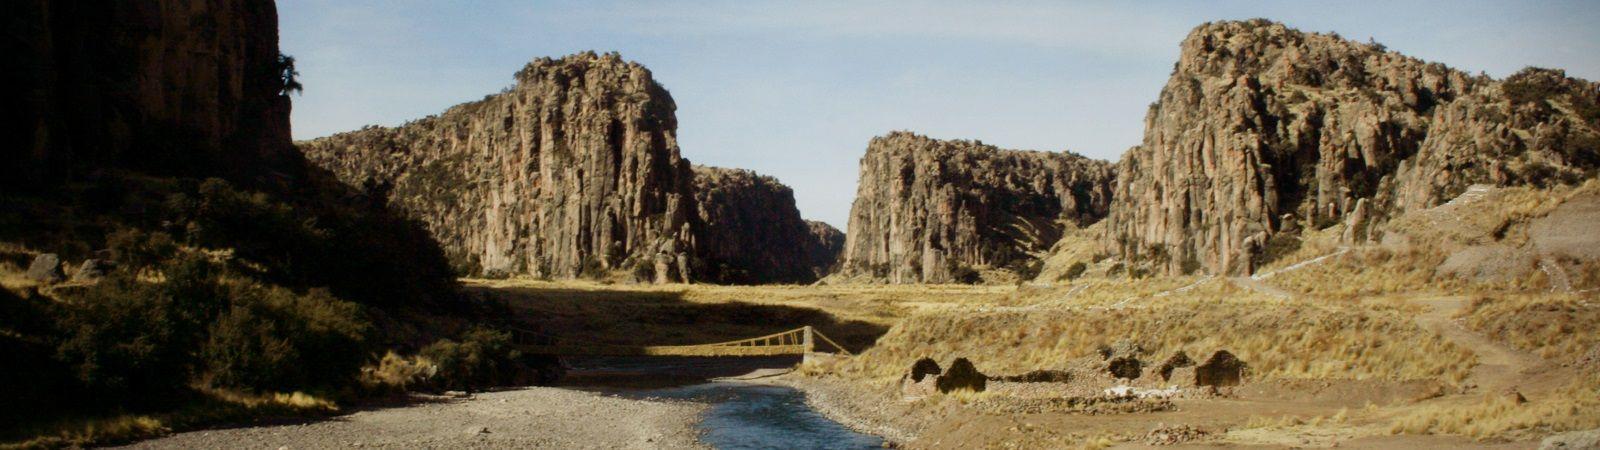 Suykutambo Canyons